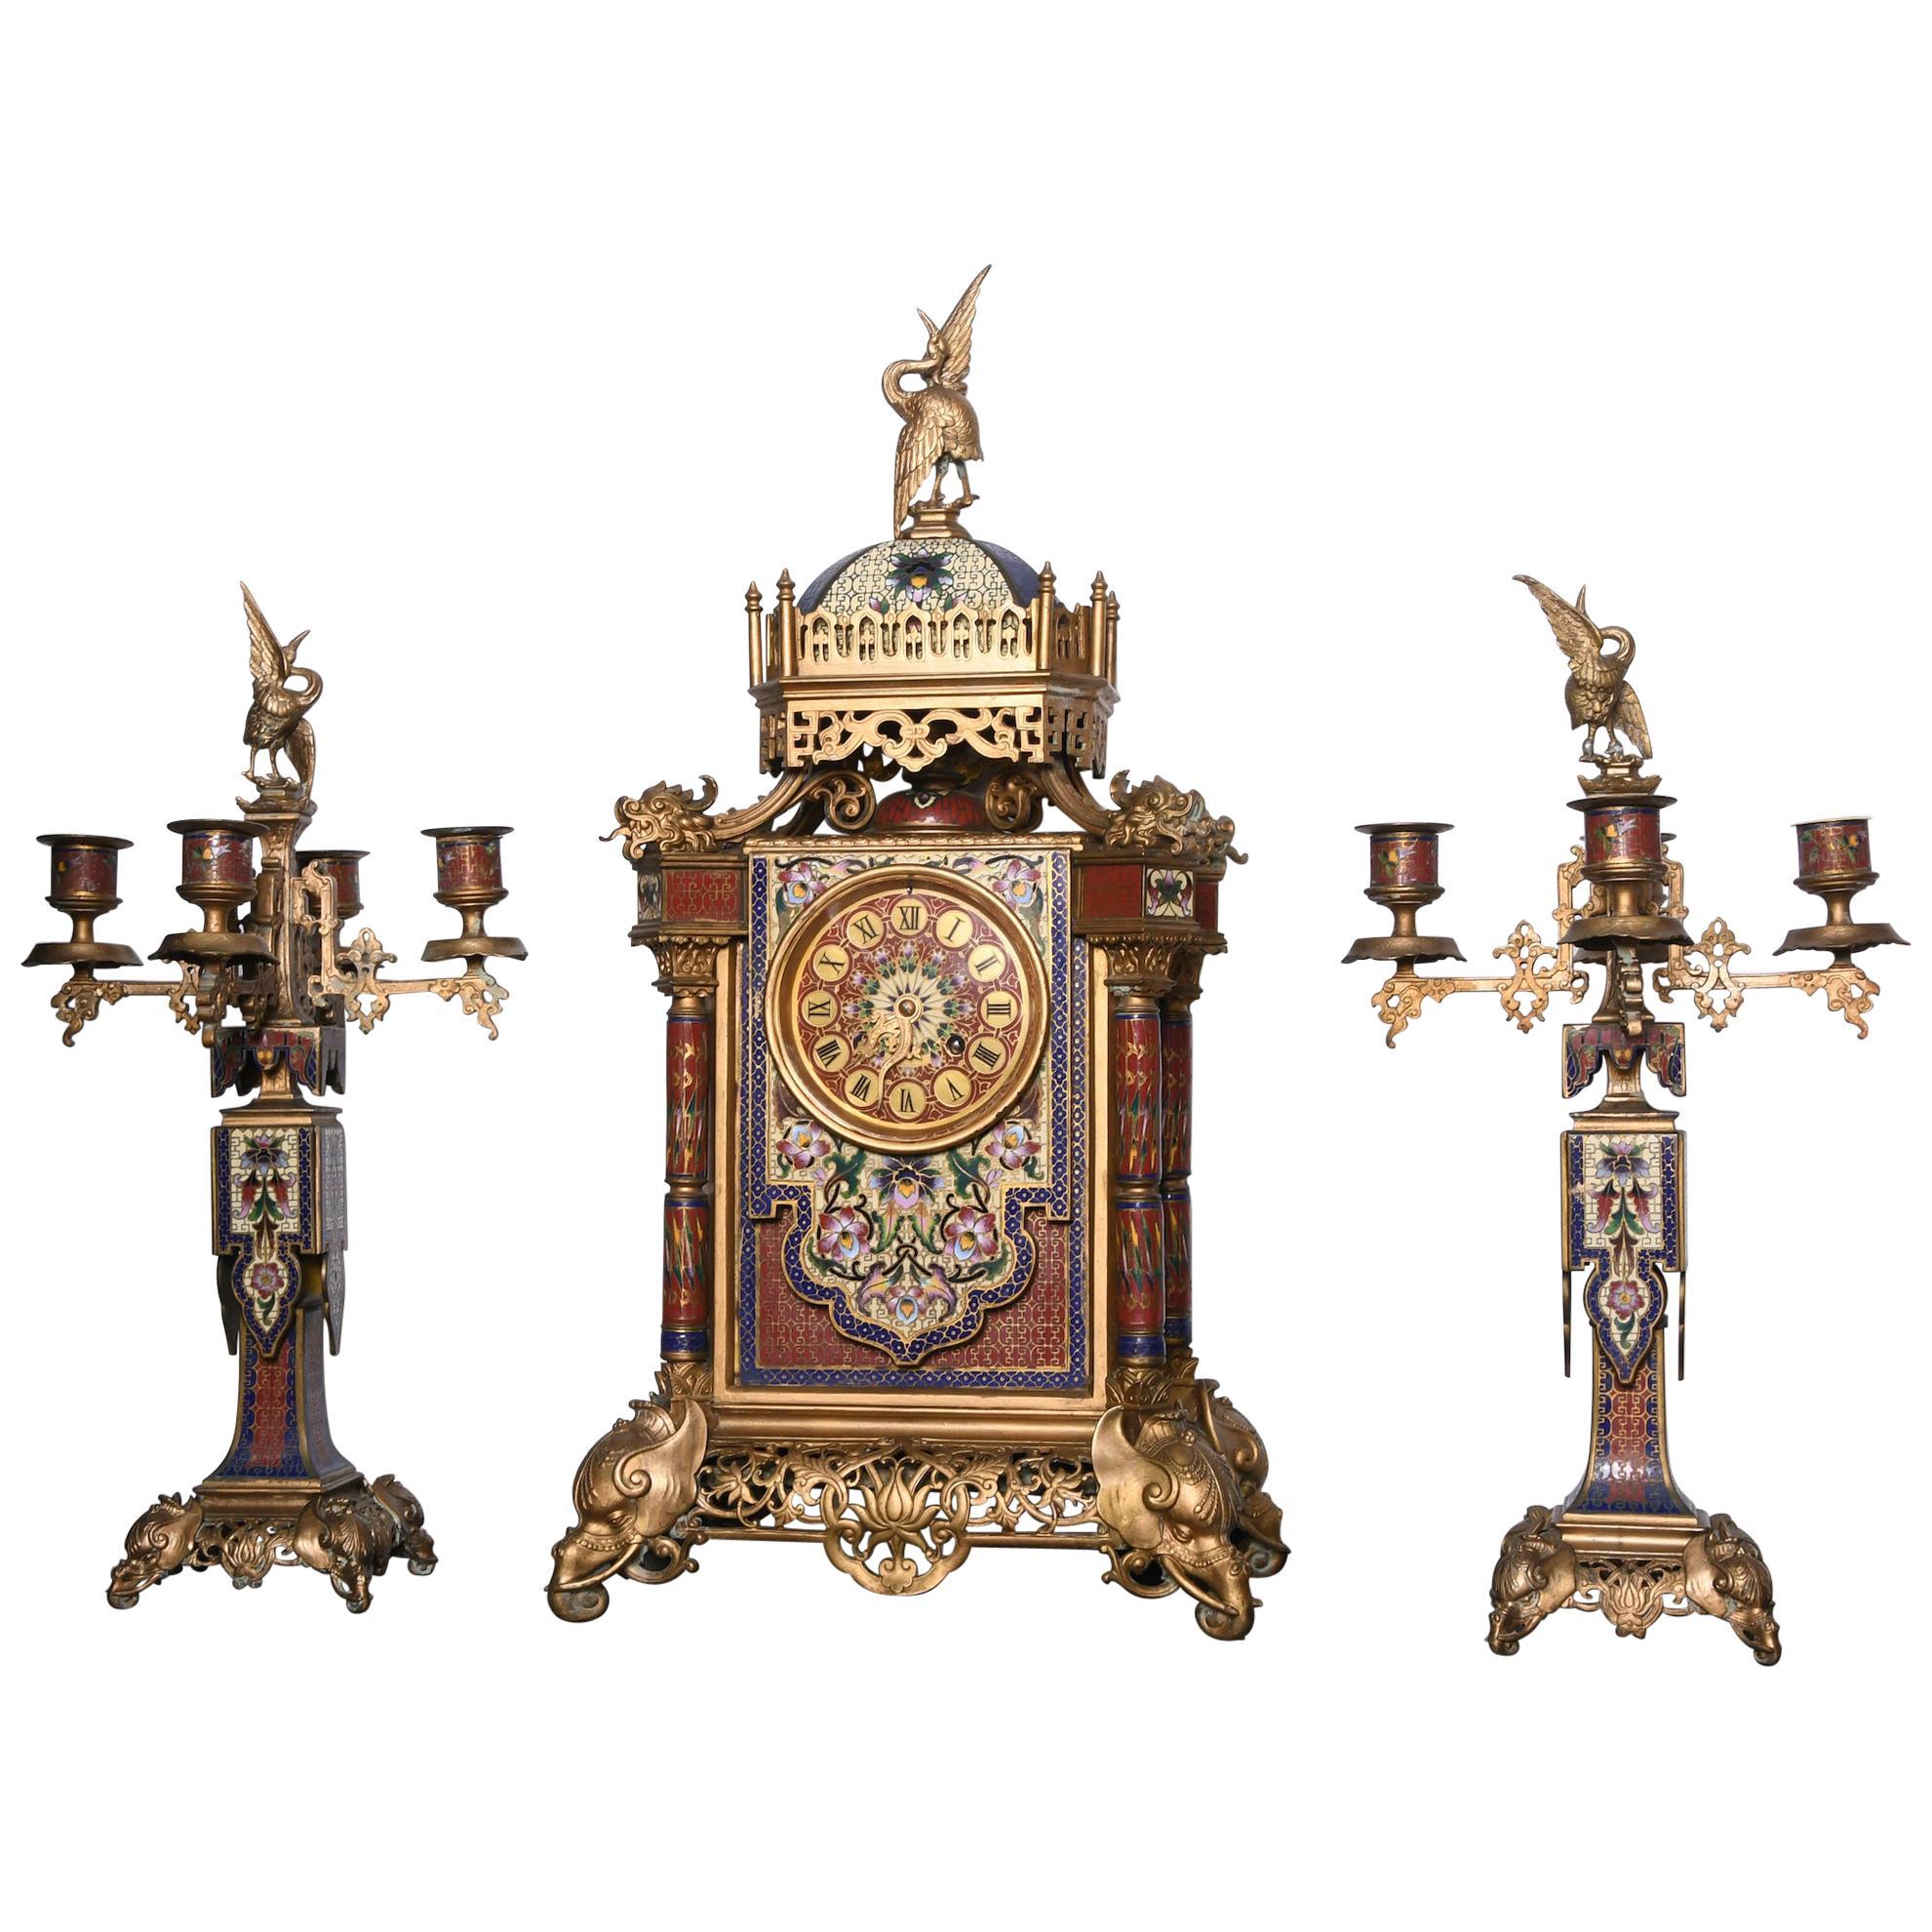 Tiffany & Co. Ormulu Bronze Champlevé Enamel Mantel Clock Garniture